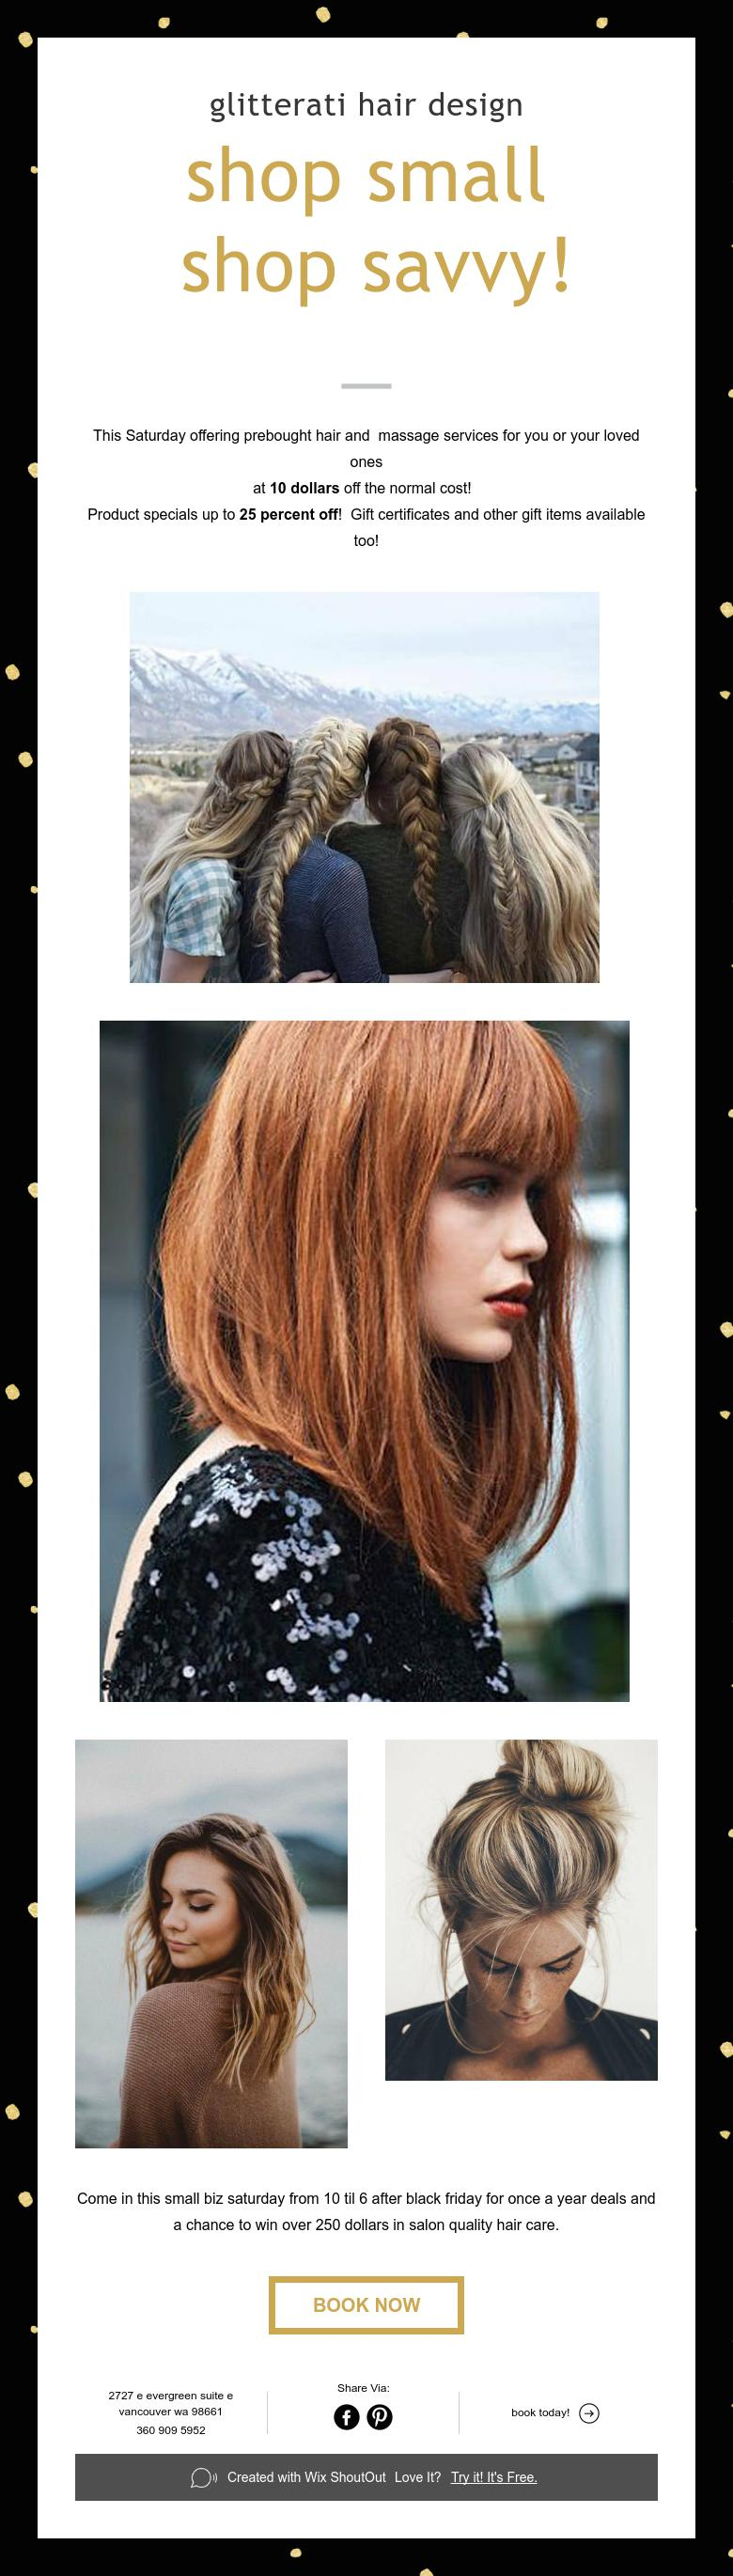 glitterati hair design  shop small  shop savvy!